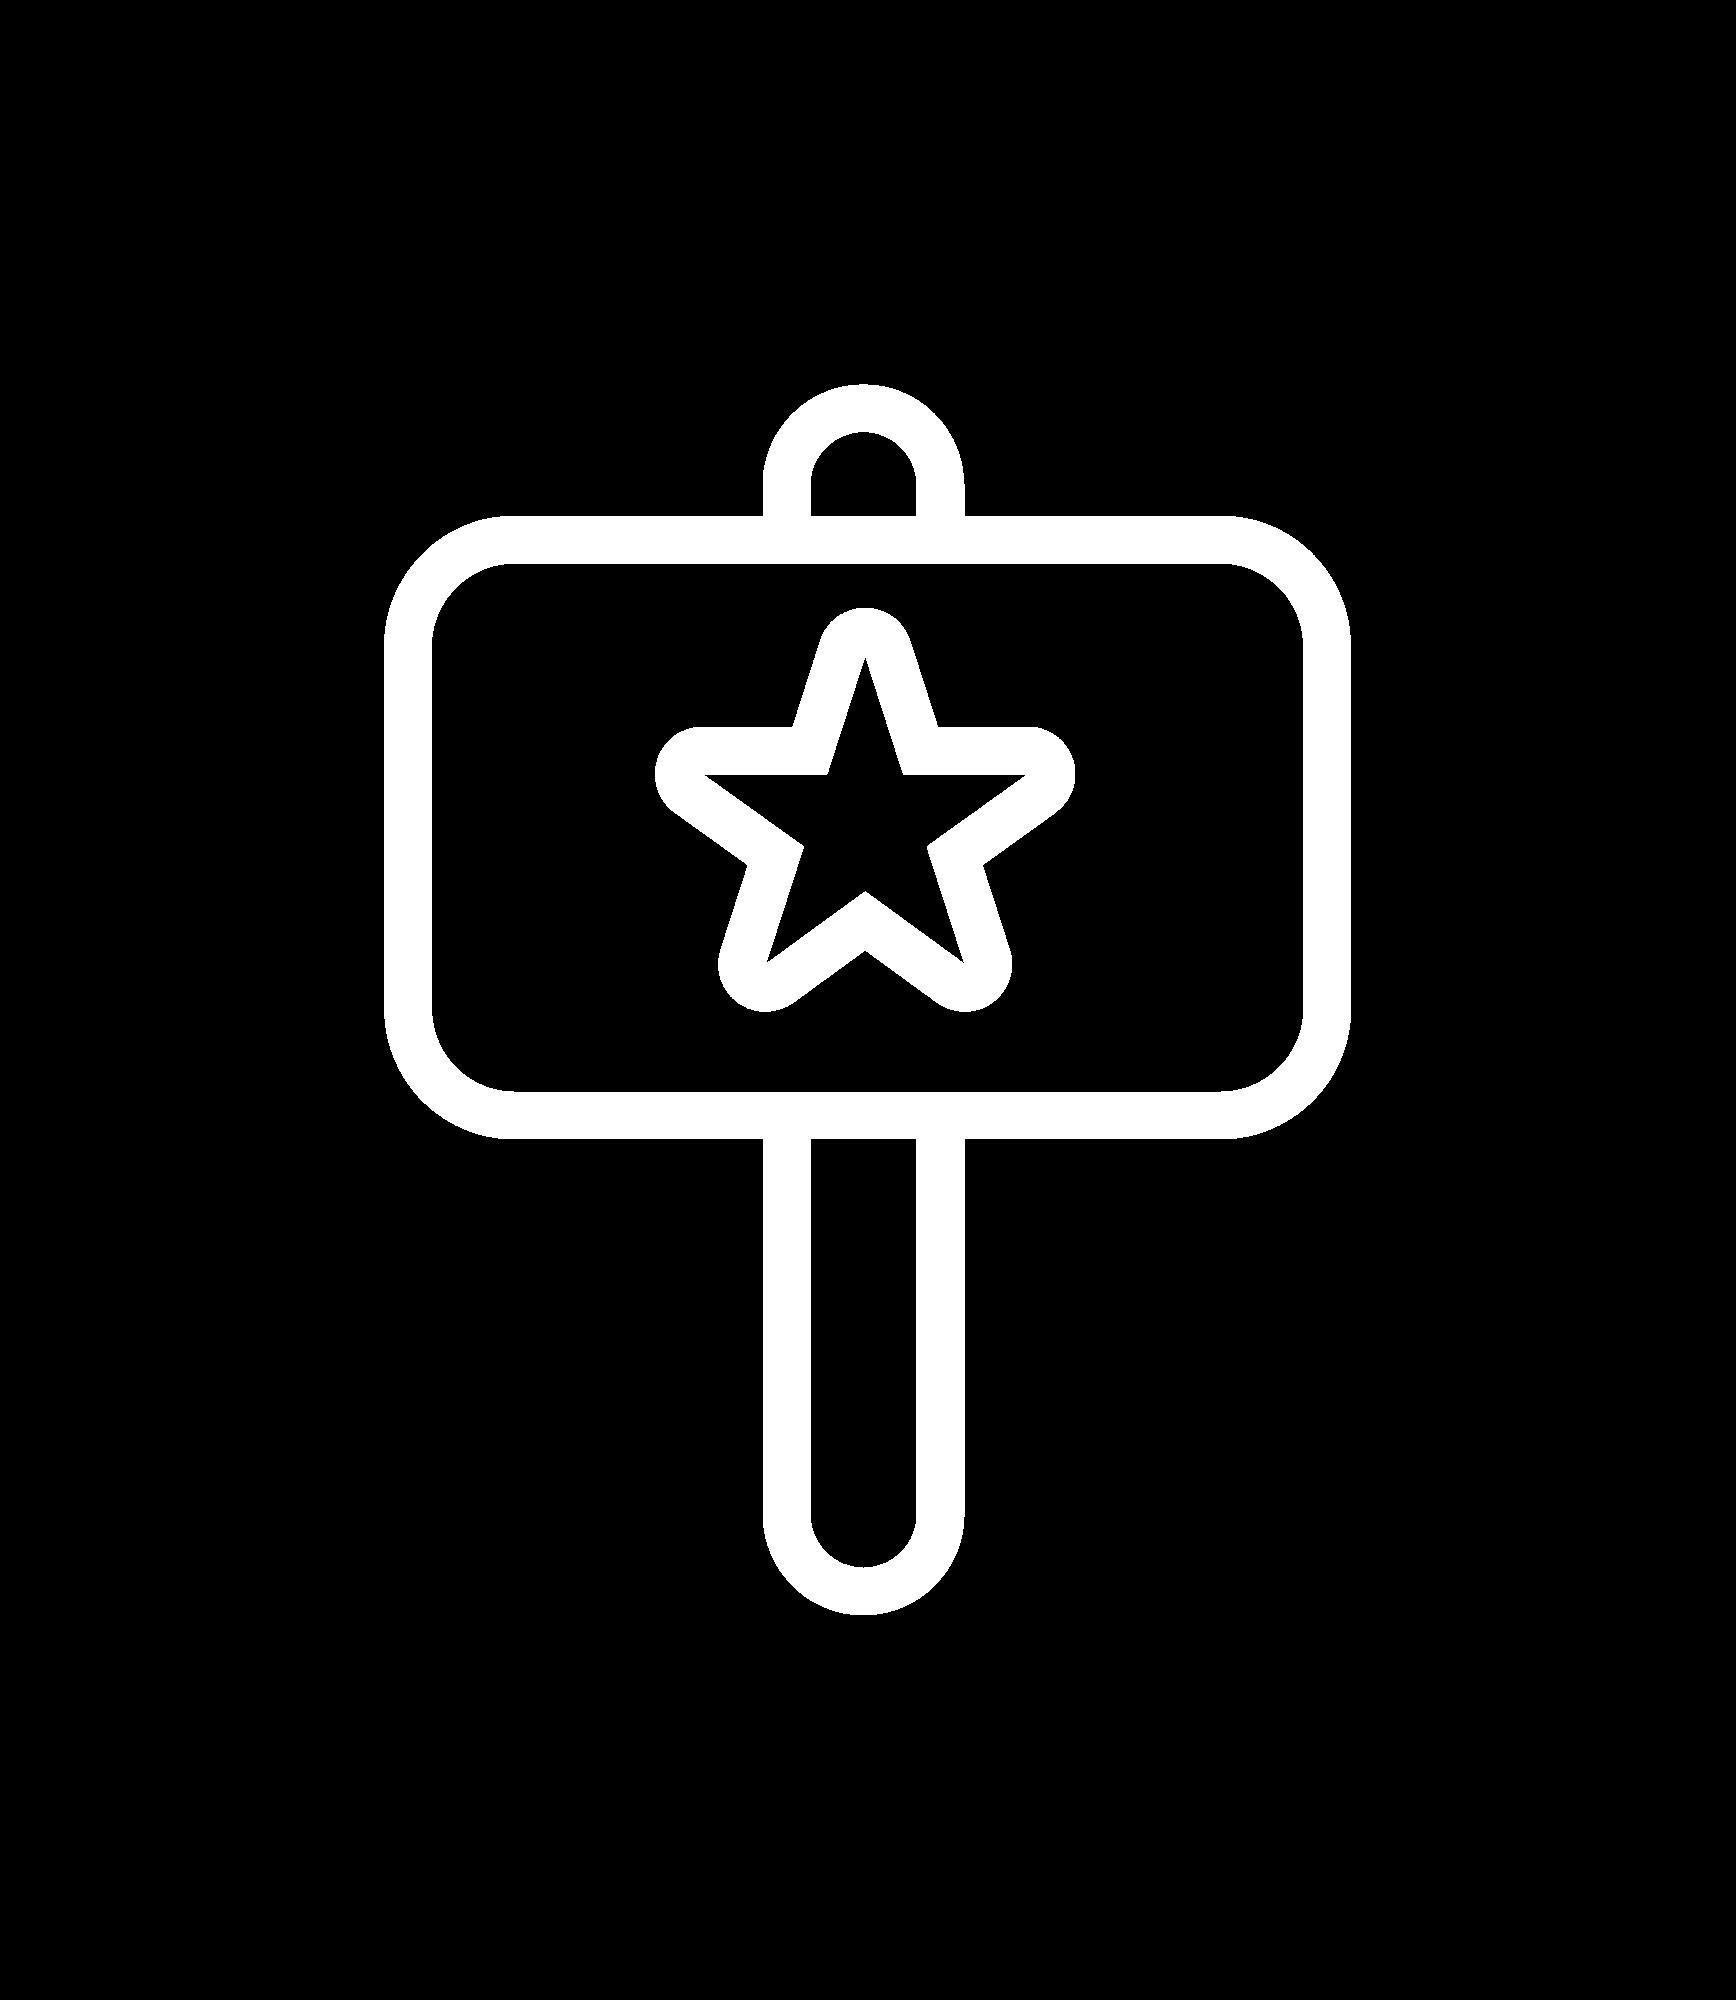 logo-white(14).png